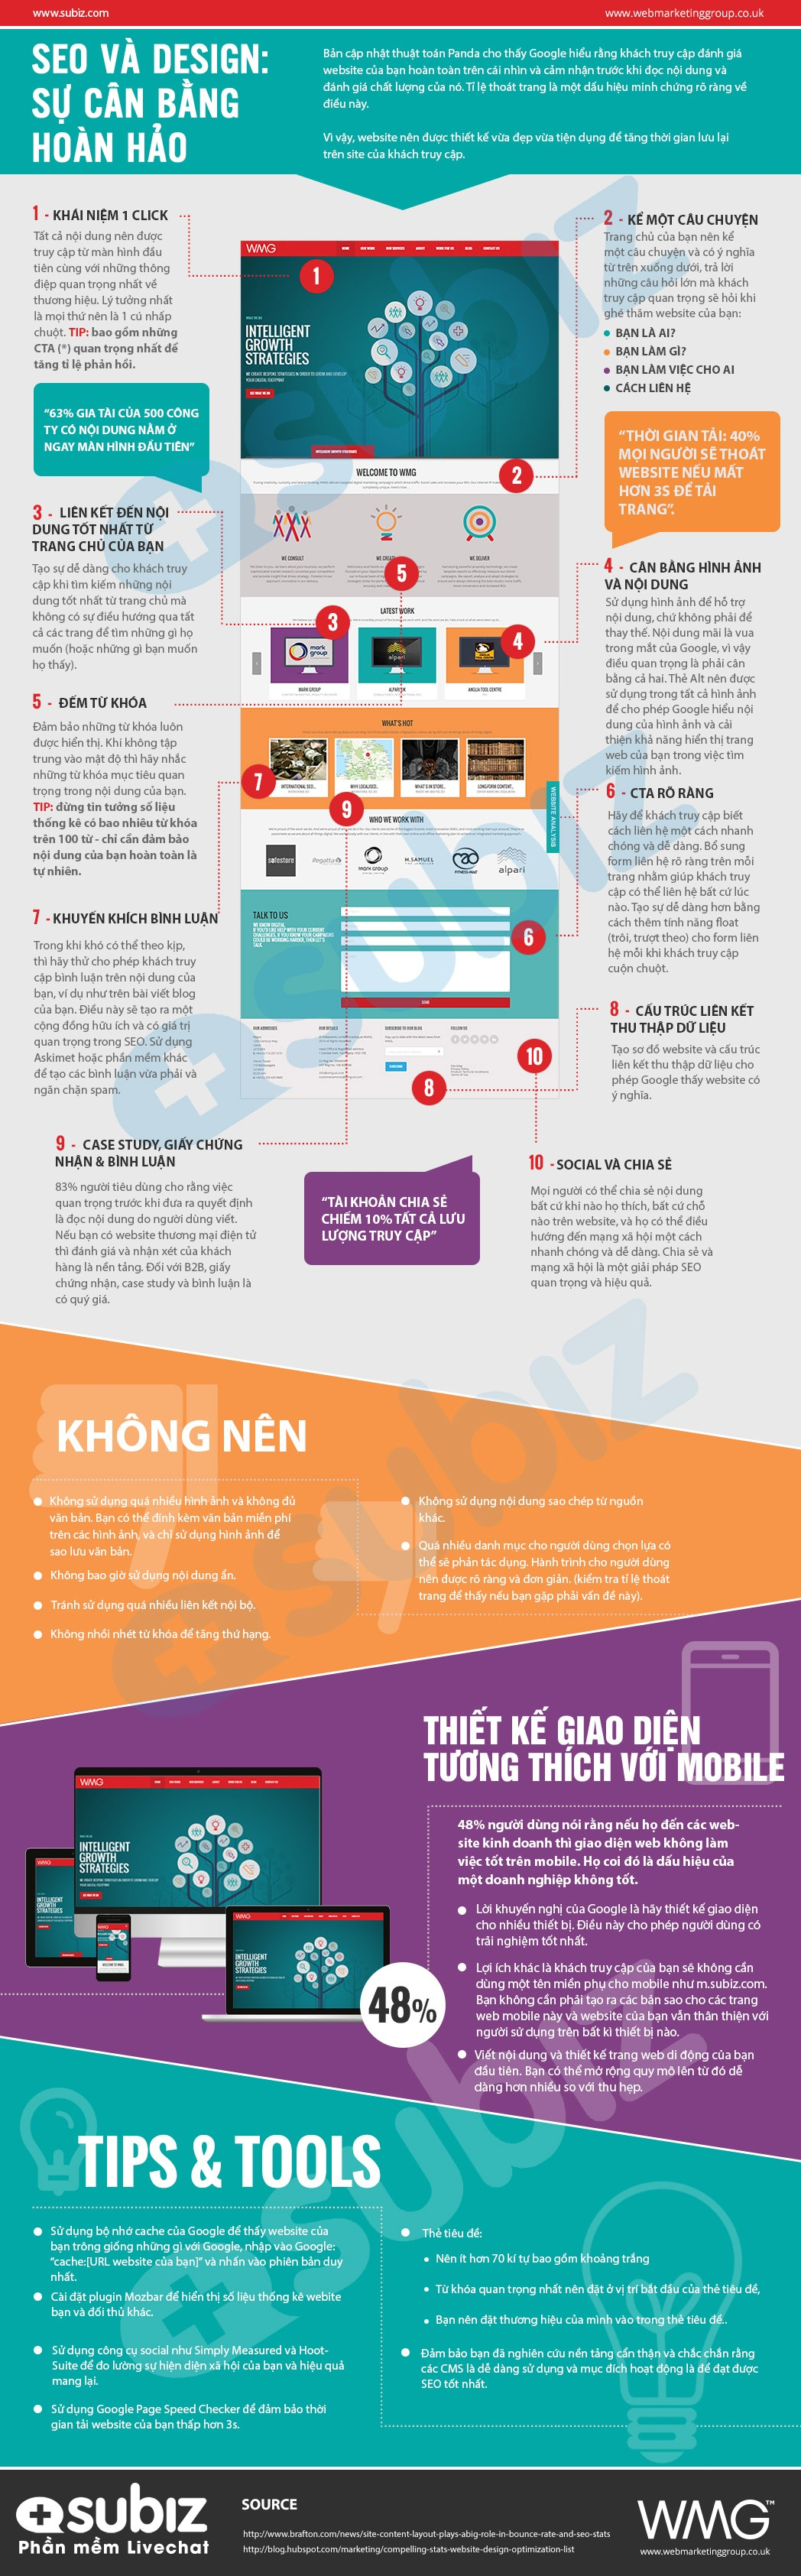 Infographic - SEO và Design